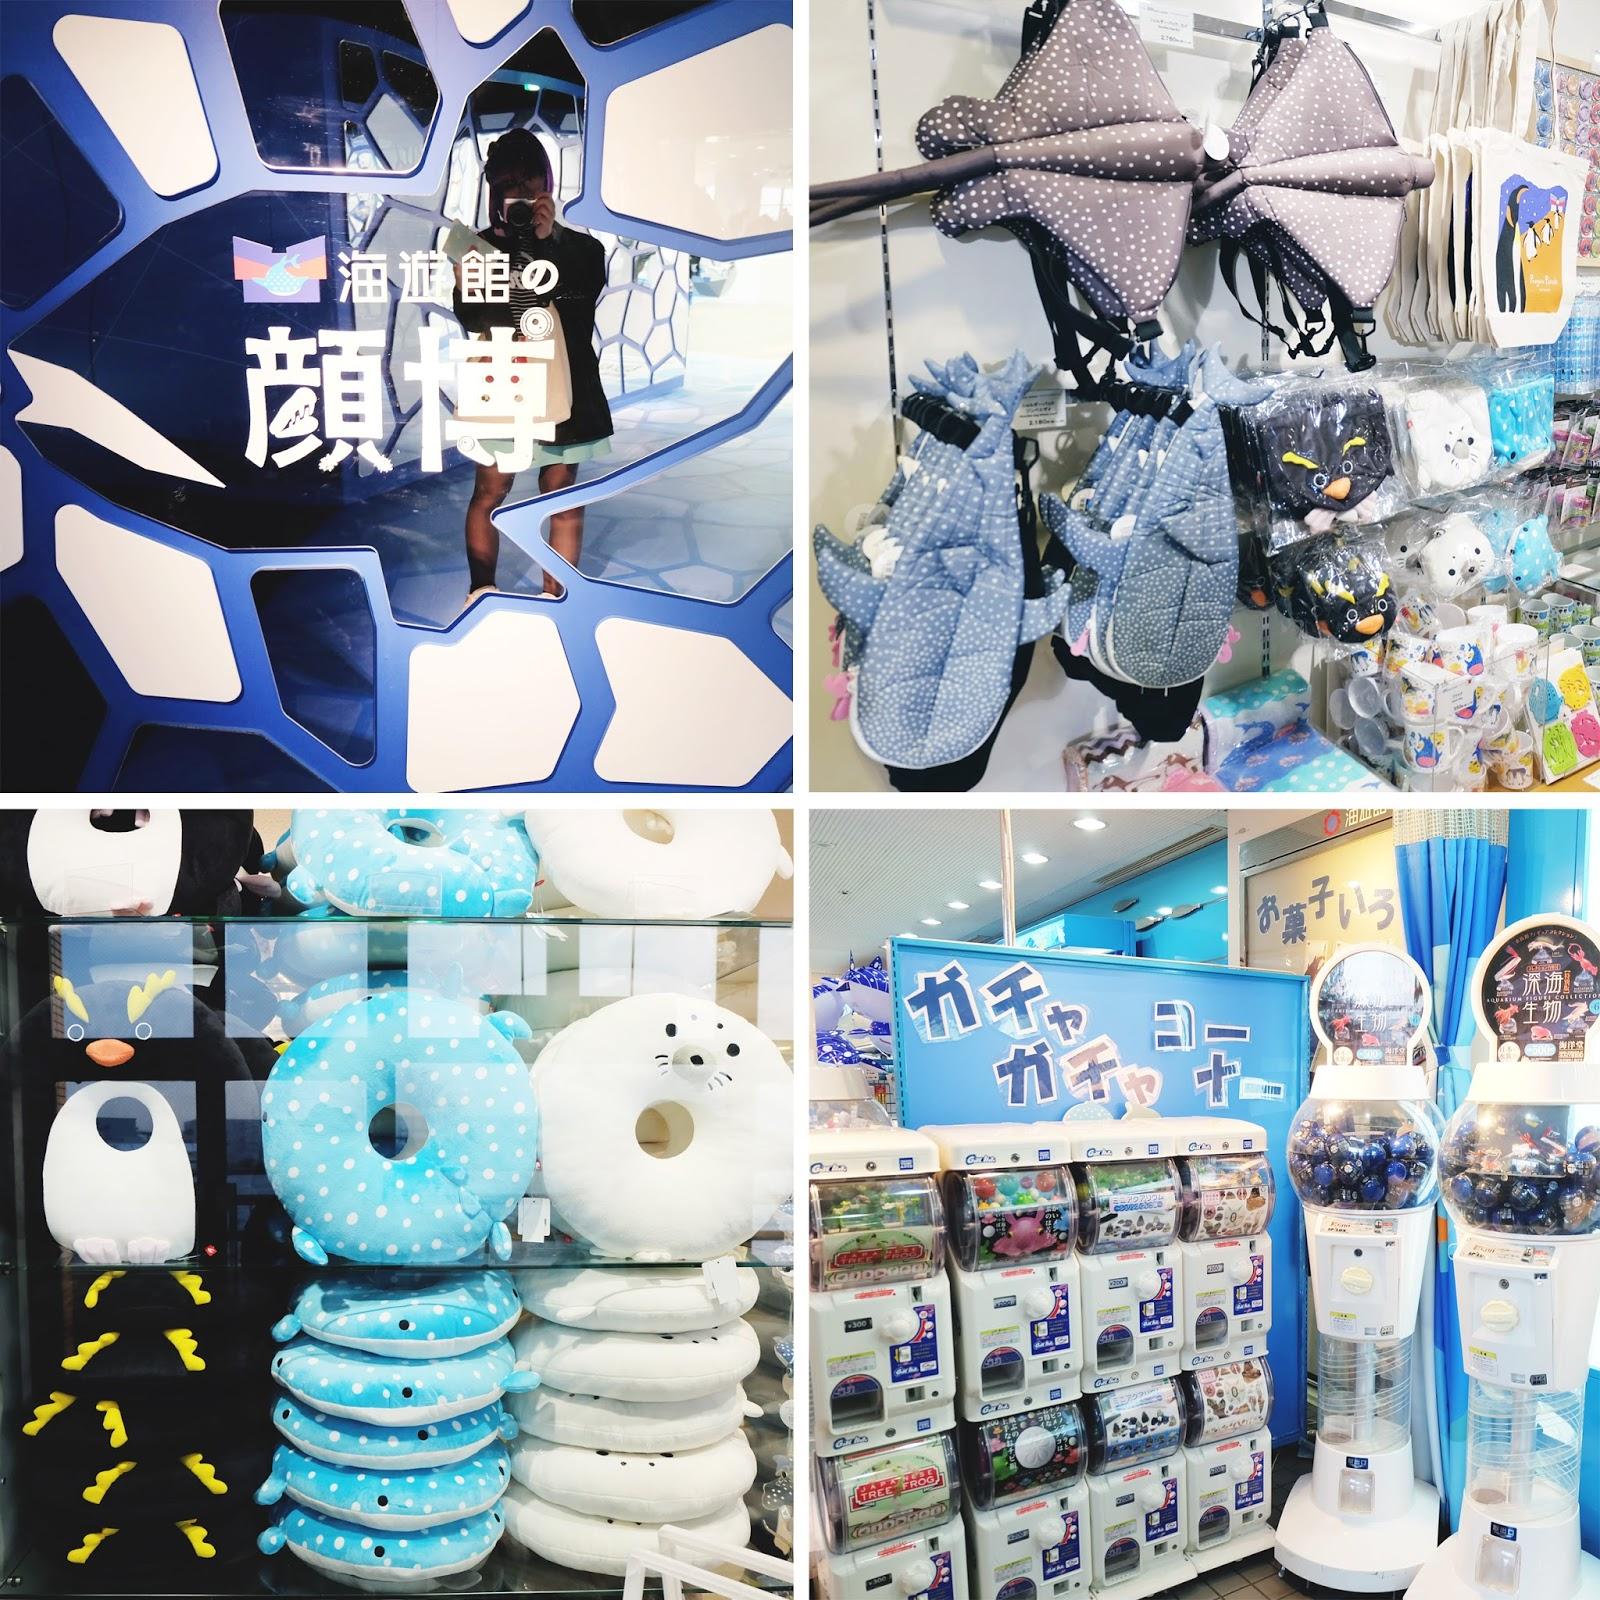 Osaka Aquarium Kaiyukan Merchandise | www.bigdreamerblog.com